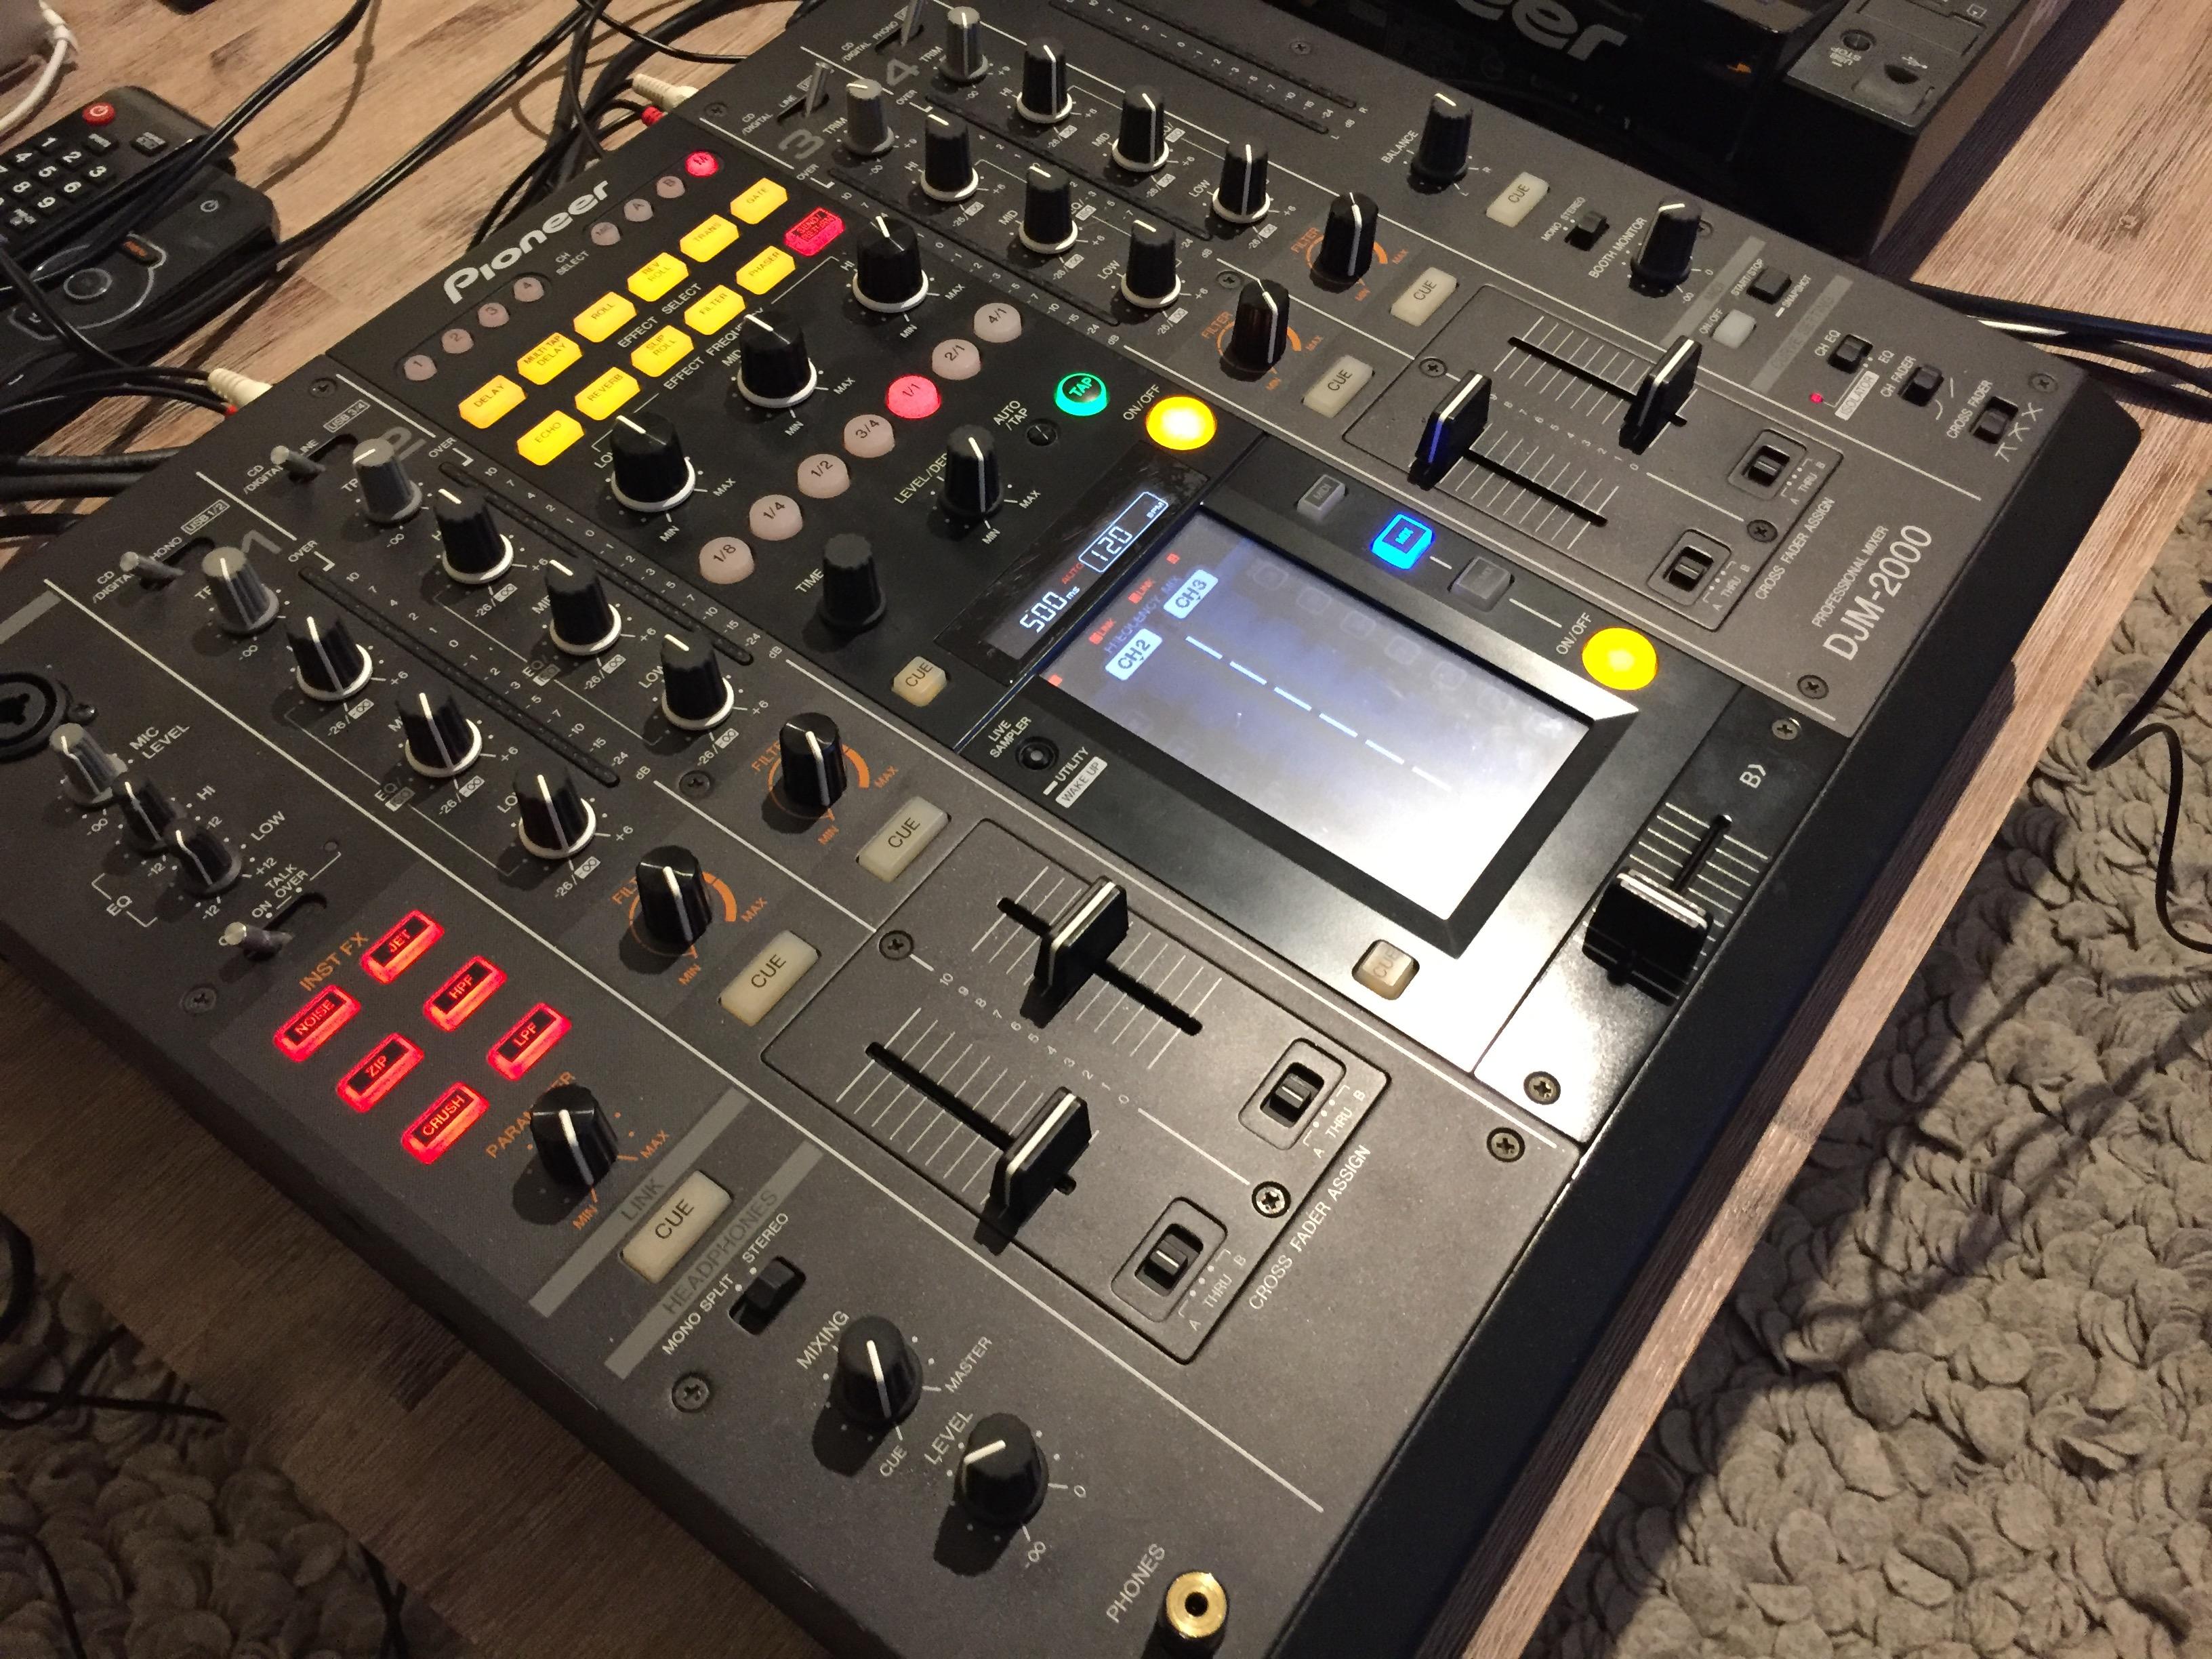 Vend table de mixage pioneer djm 2000 ile de france - Table de mixage pioneer djm 2000 ...